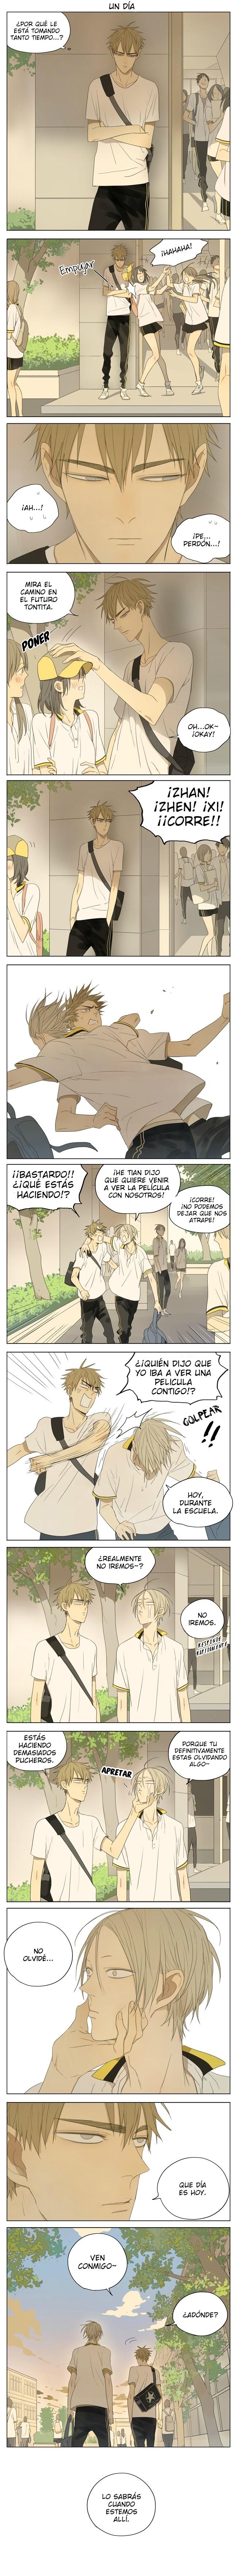 http://c5.ninemanga.com/es_manga/7/15943/392075/04c195a32891a5d8ccd949a1539fc45f.jpg Page 7